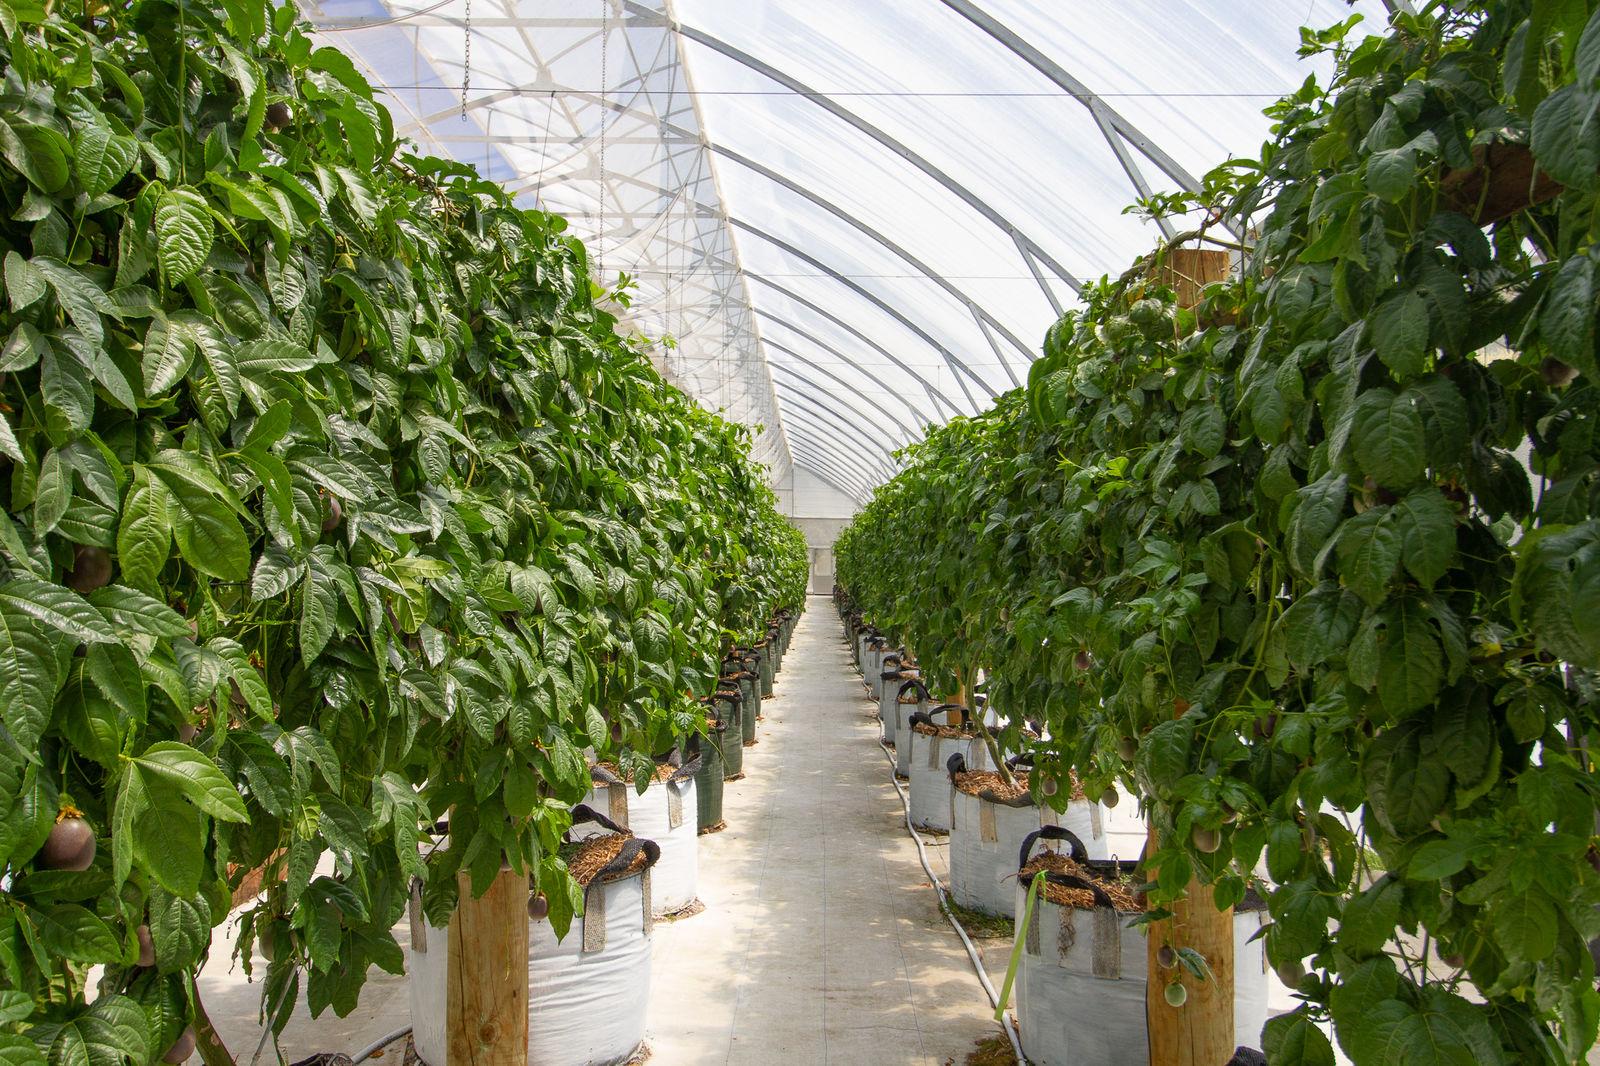 Passionfruit plants growing inside a CEA greenhouse